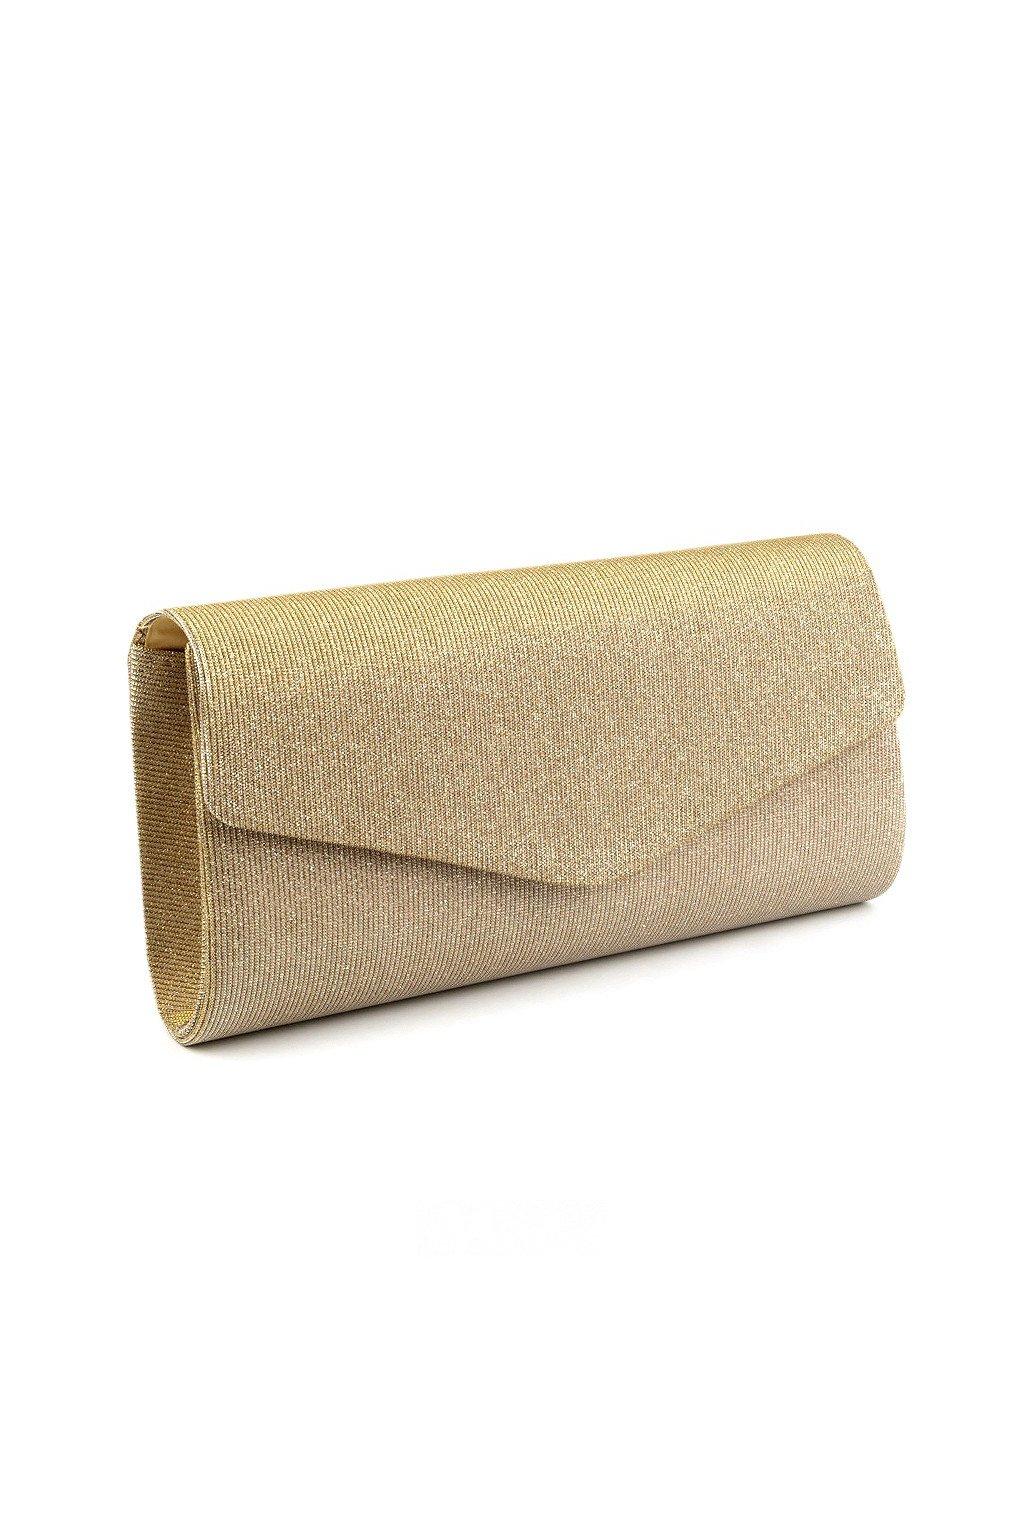 Psaníčko kabelka zlaté s lurexem